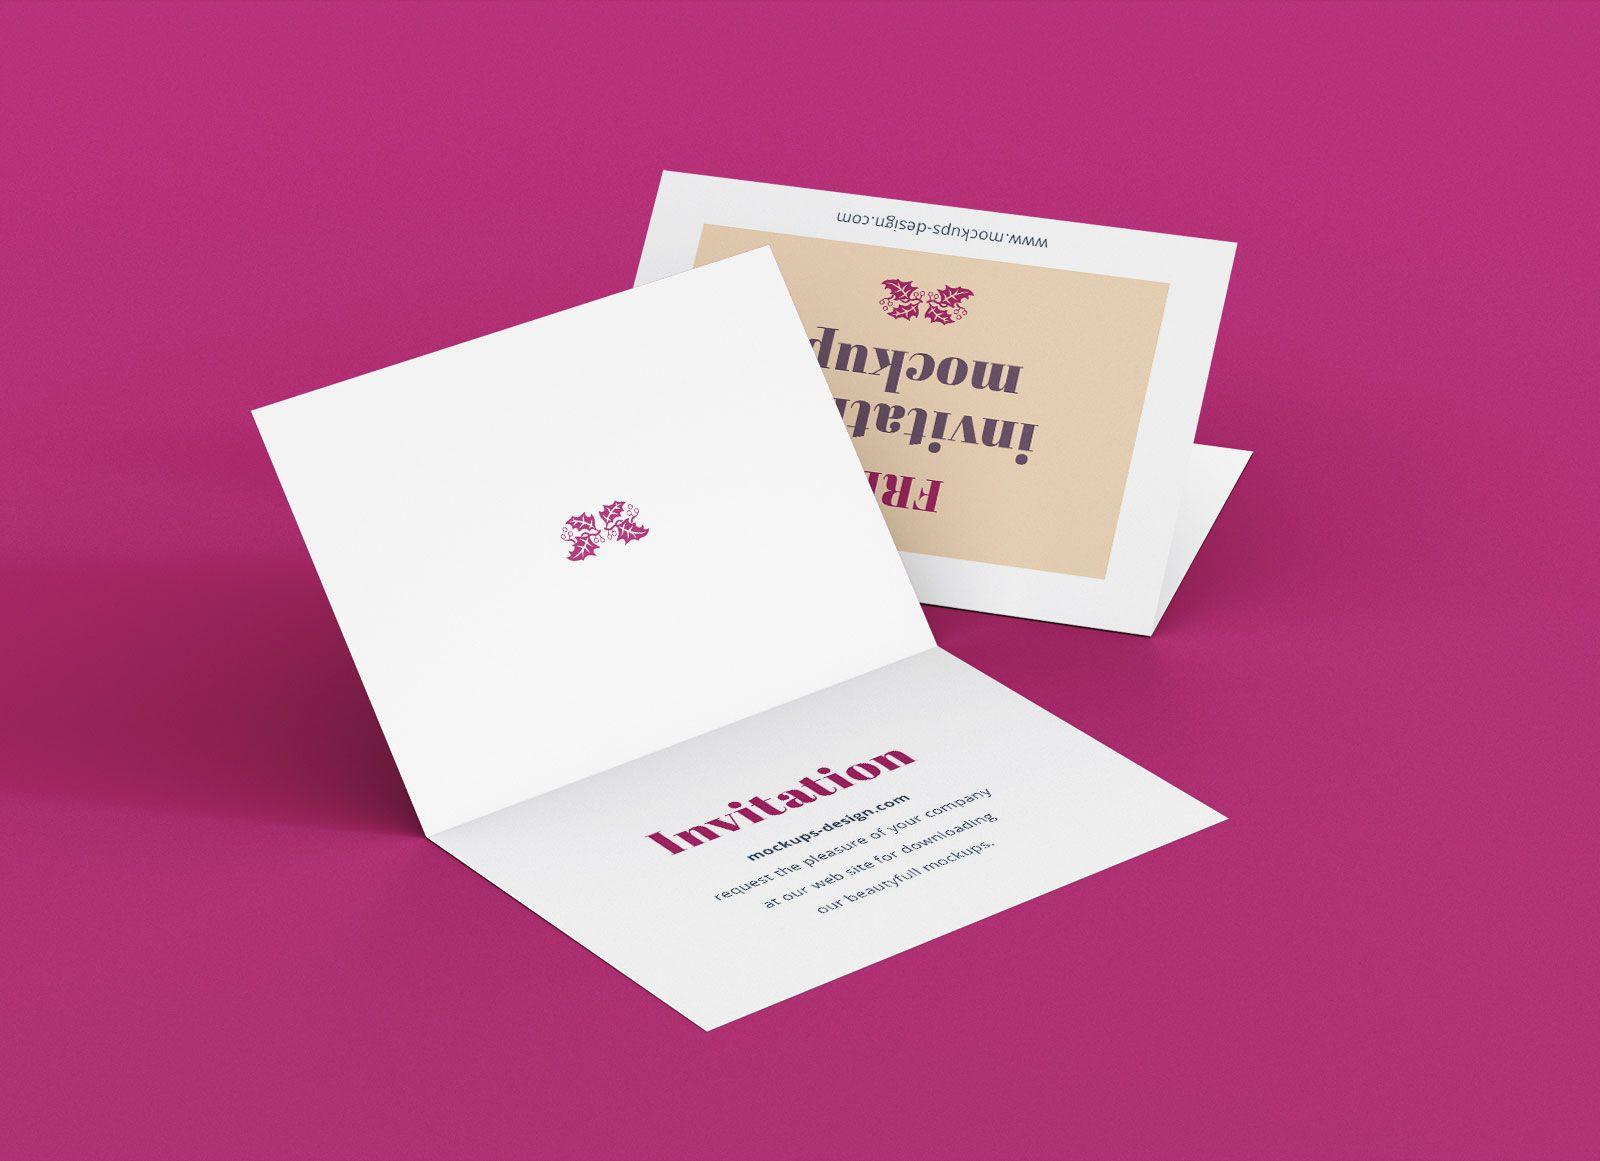 Free A7 Bi Fold Greeting Invitation Card Mockup Psd Set For Card Folding Templates Free Great Sample Te In 2020 Invitation Mockup Card Template Invitation Template